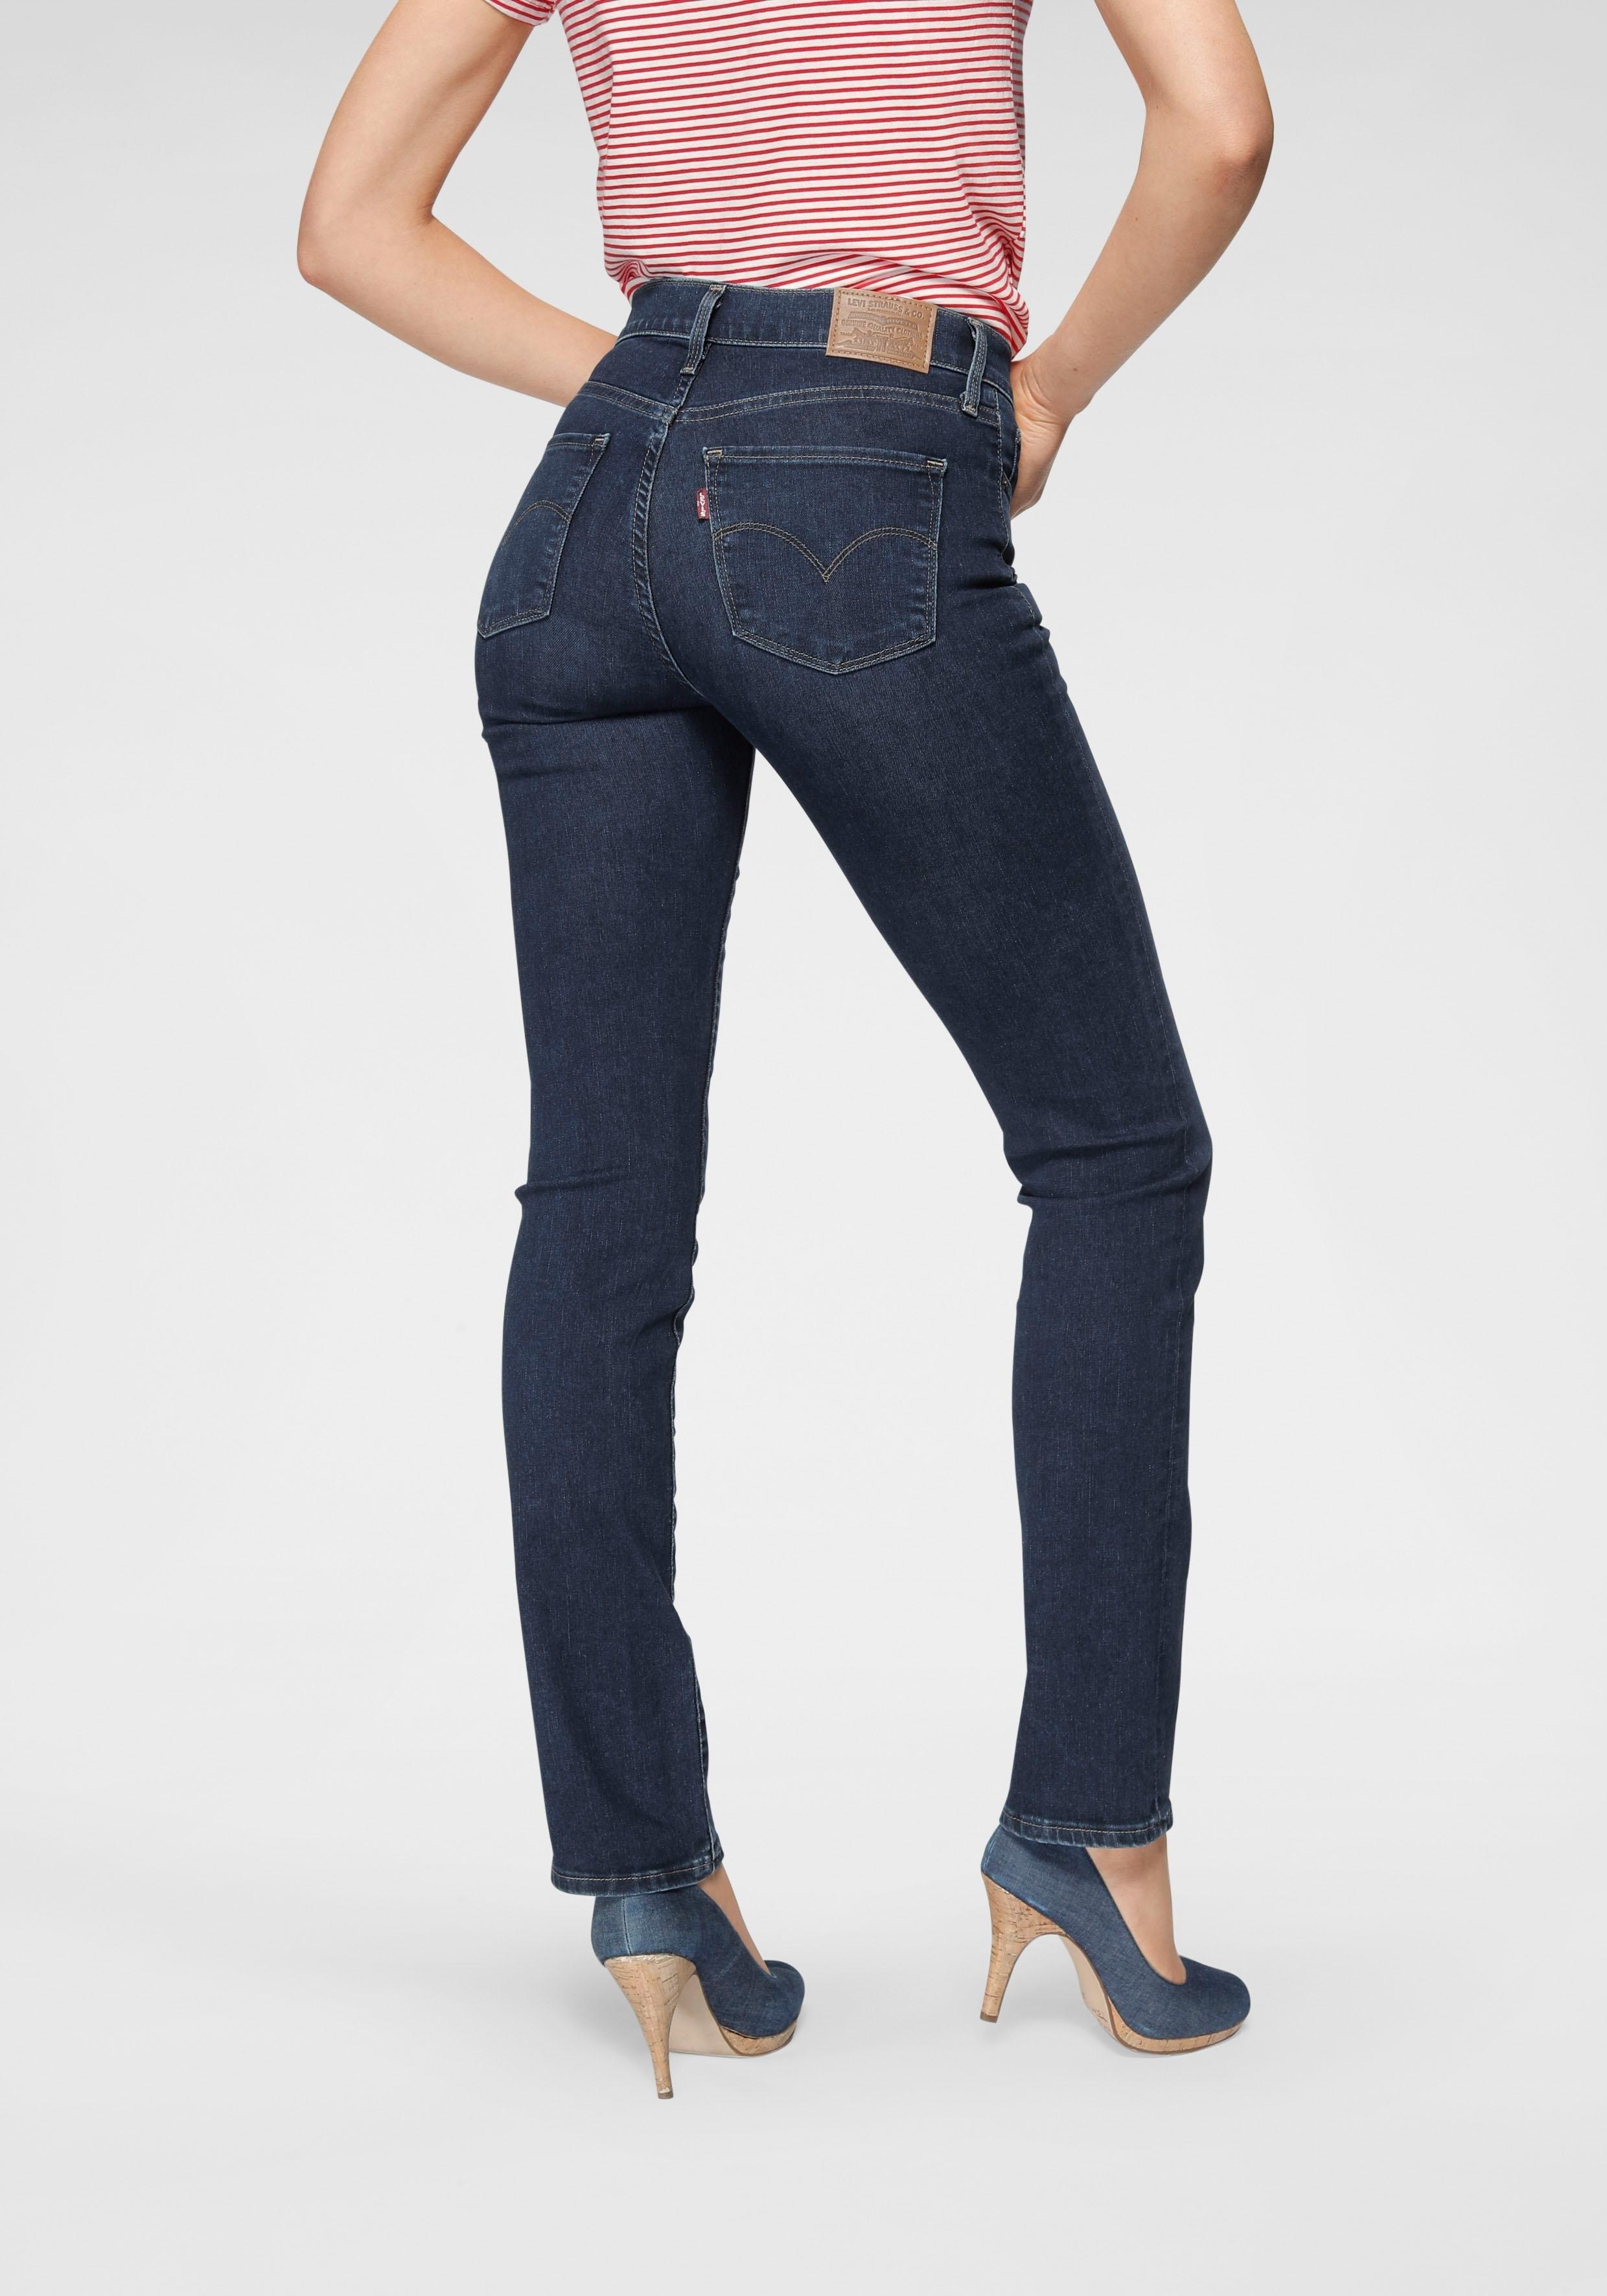 LEVI'S ® rechte jeans »314 Shaping Straight« goedkoop op otto.nl kopen